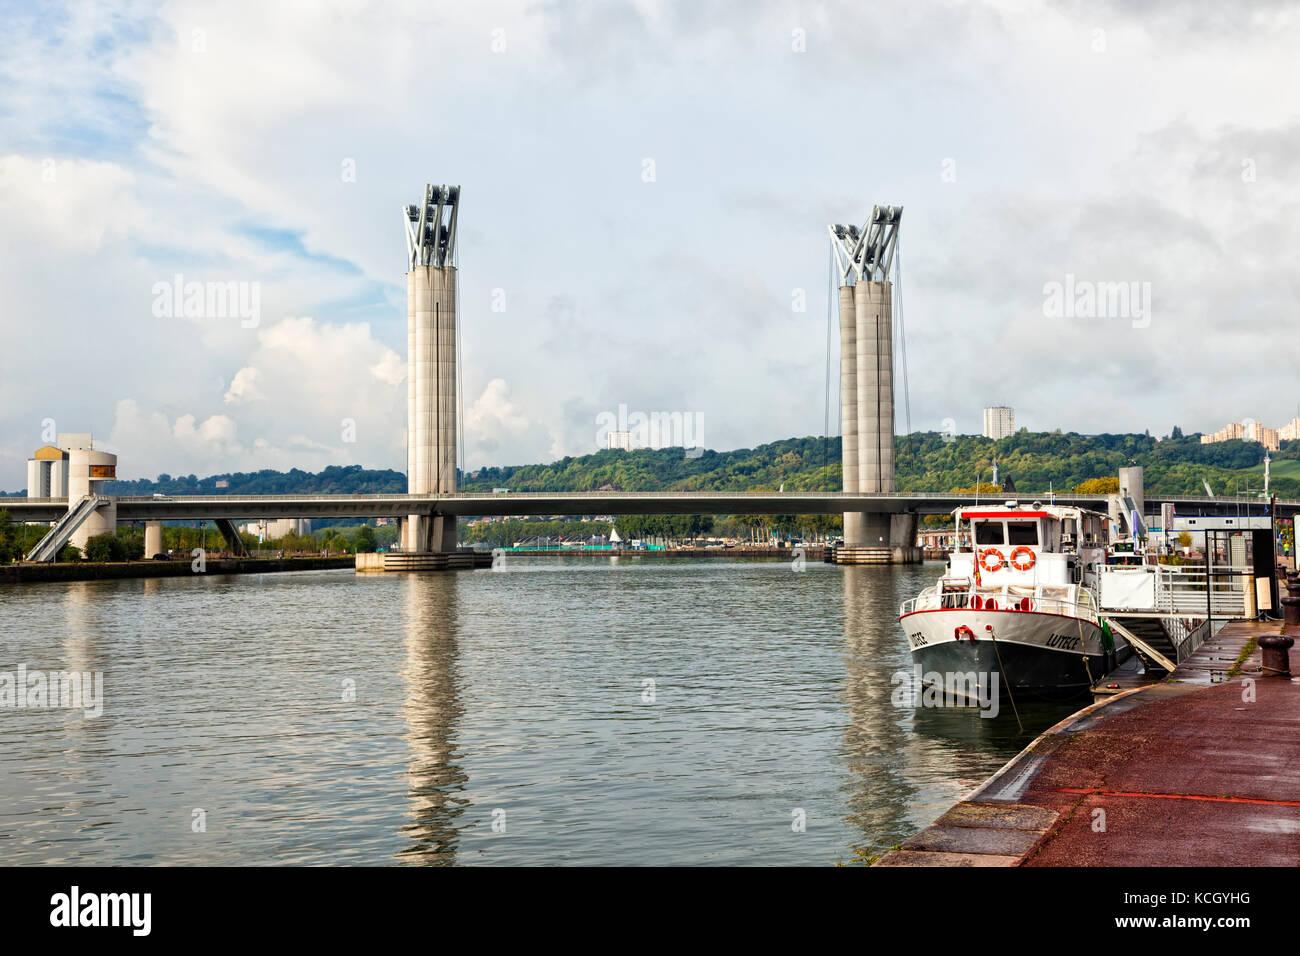 Pont Gustave Flaubert, a vertical-lift bridge crossing Seine river at Rouen - Stock Image